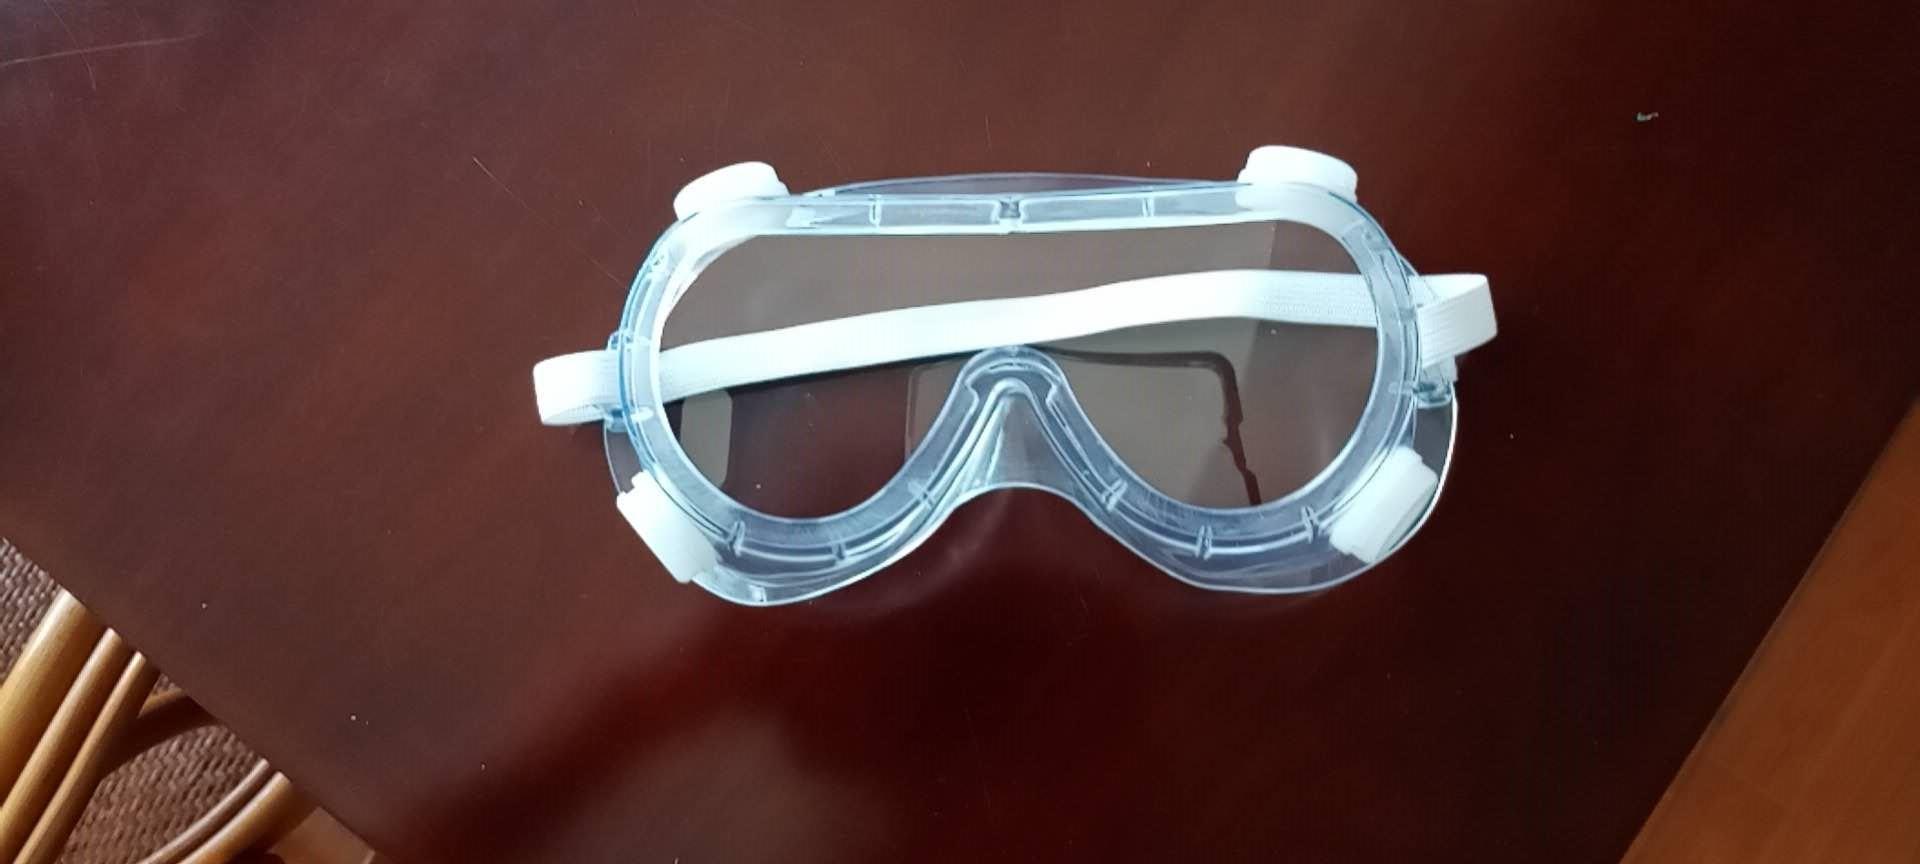 Safety Glasses for Virus Time 1